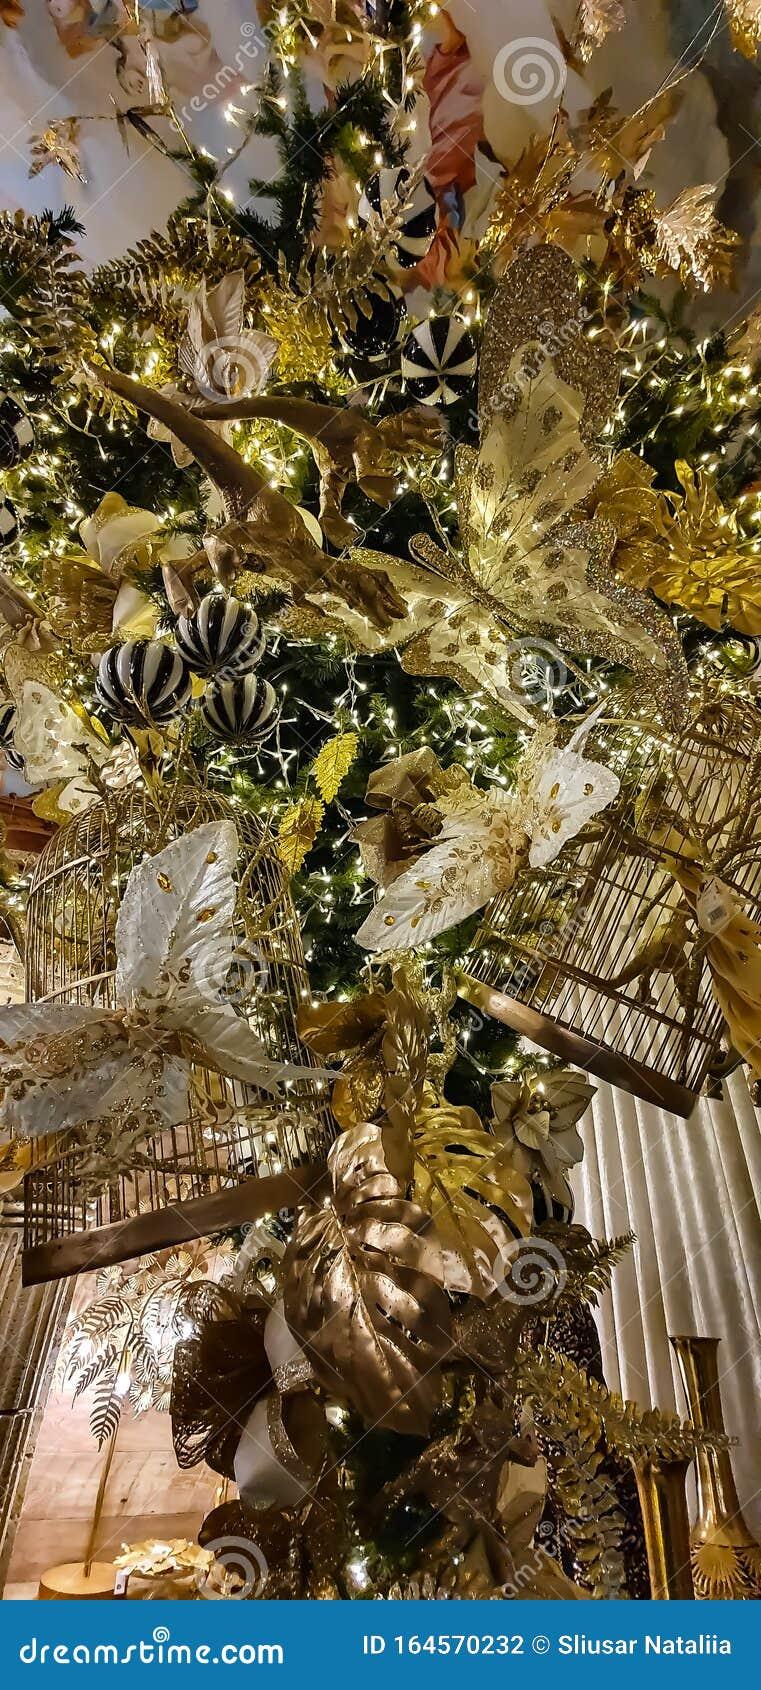 Christmas Decorations Golden Dinosaurs On Christmas Tree Stock Photo Image Of Dinosaurs Decorations 164570232